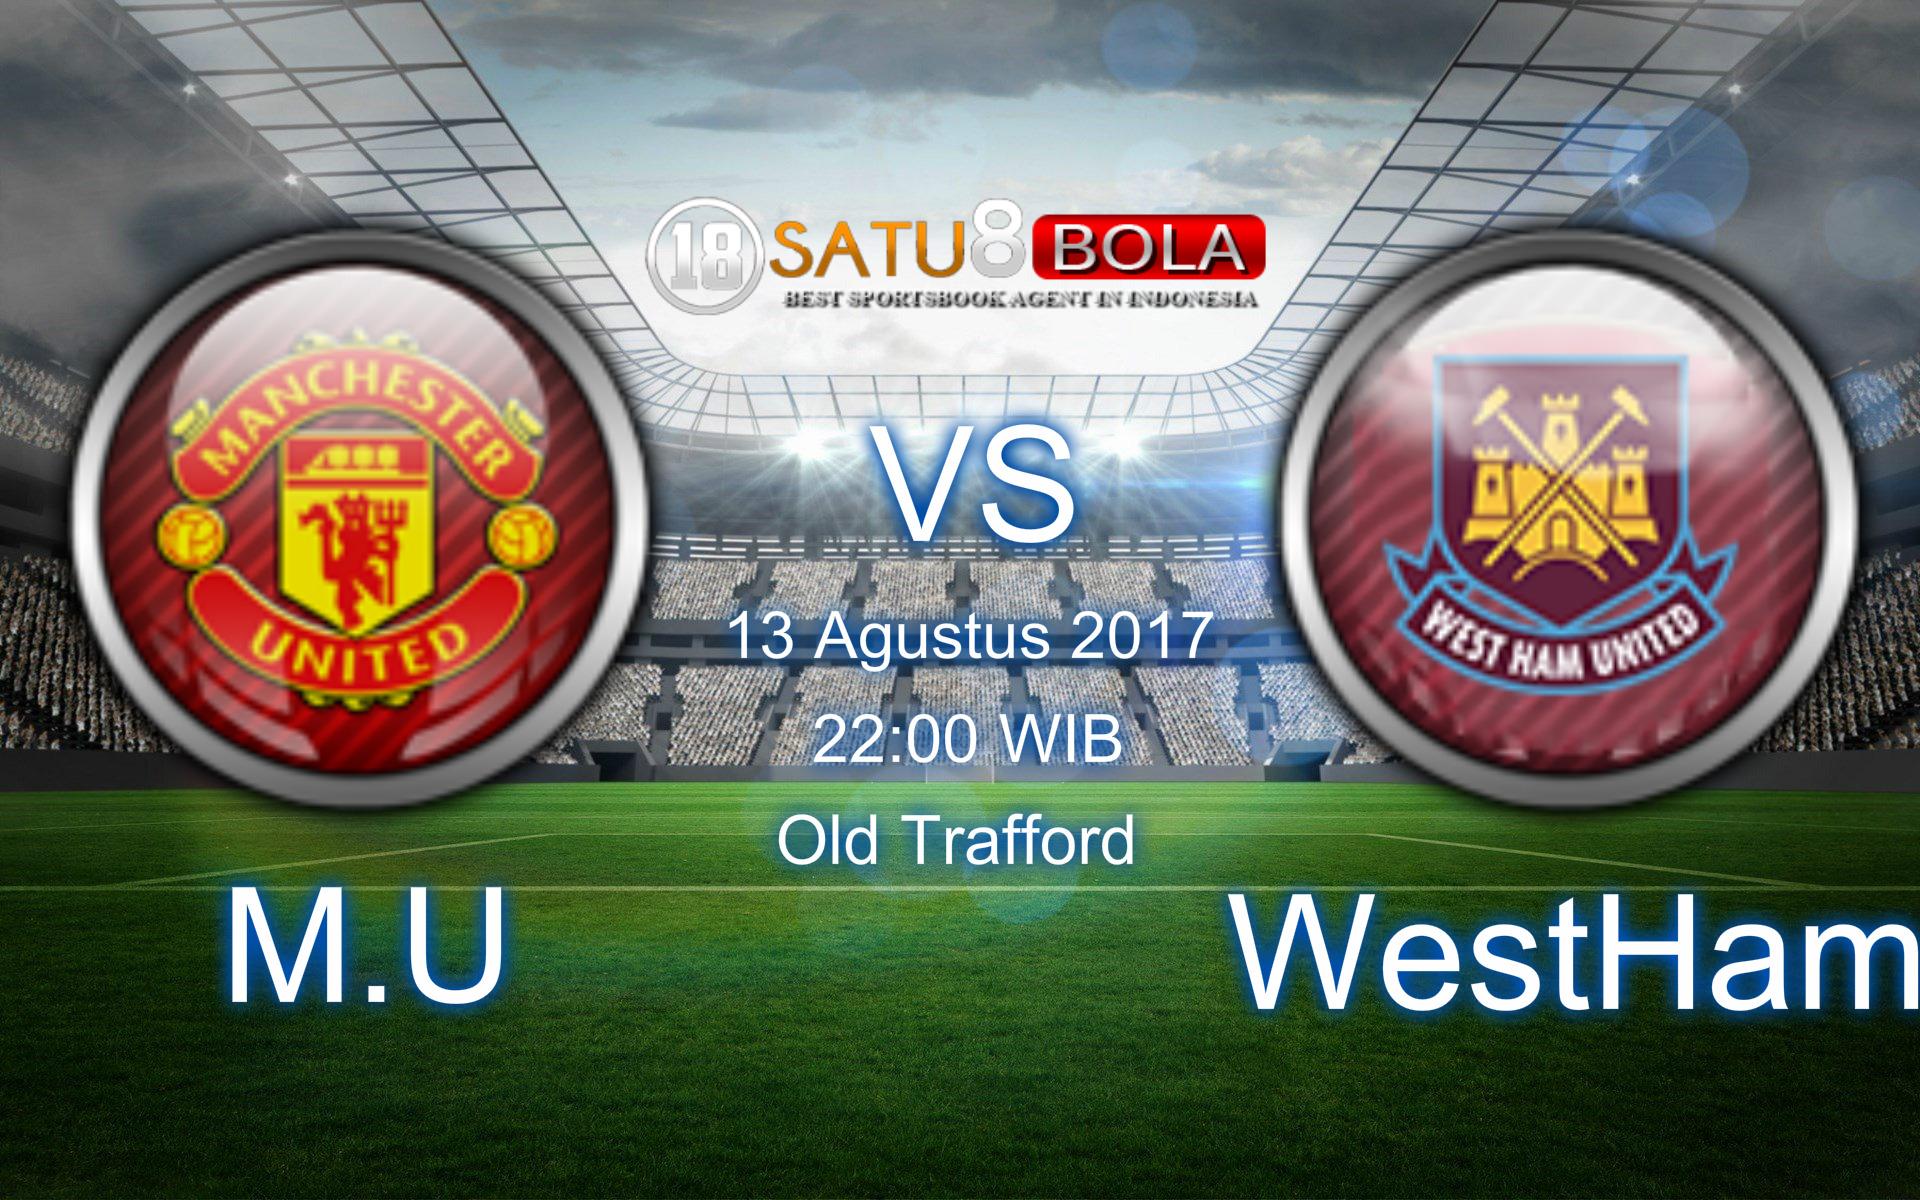 Prediksi Manchester United vs West Ham United 13 Agustus 2017